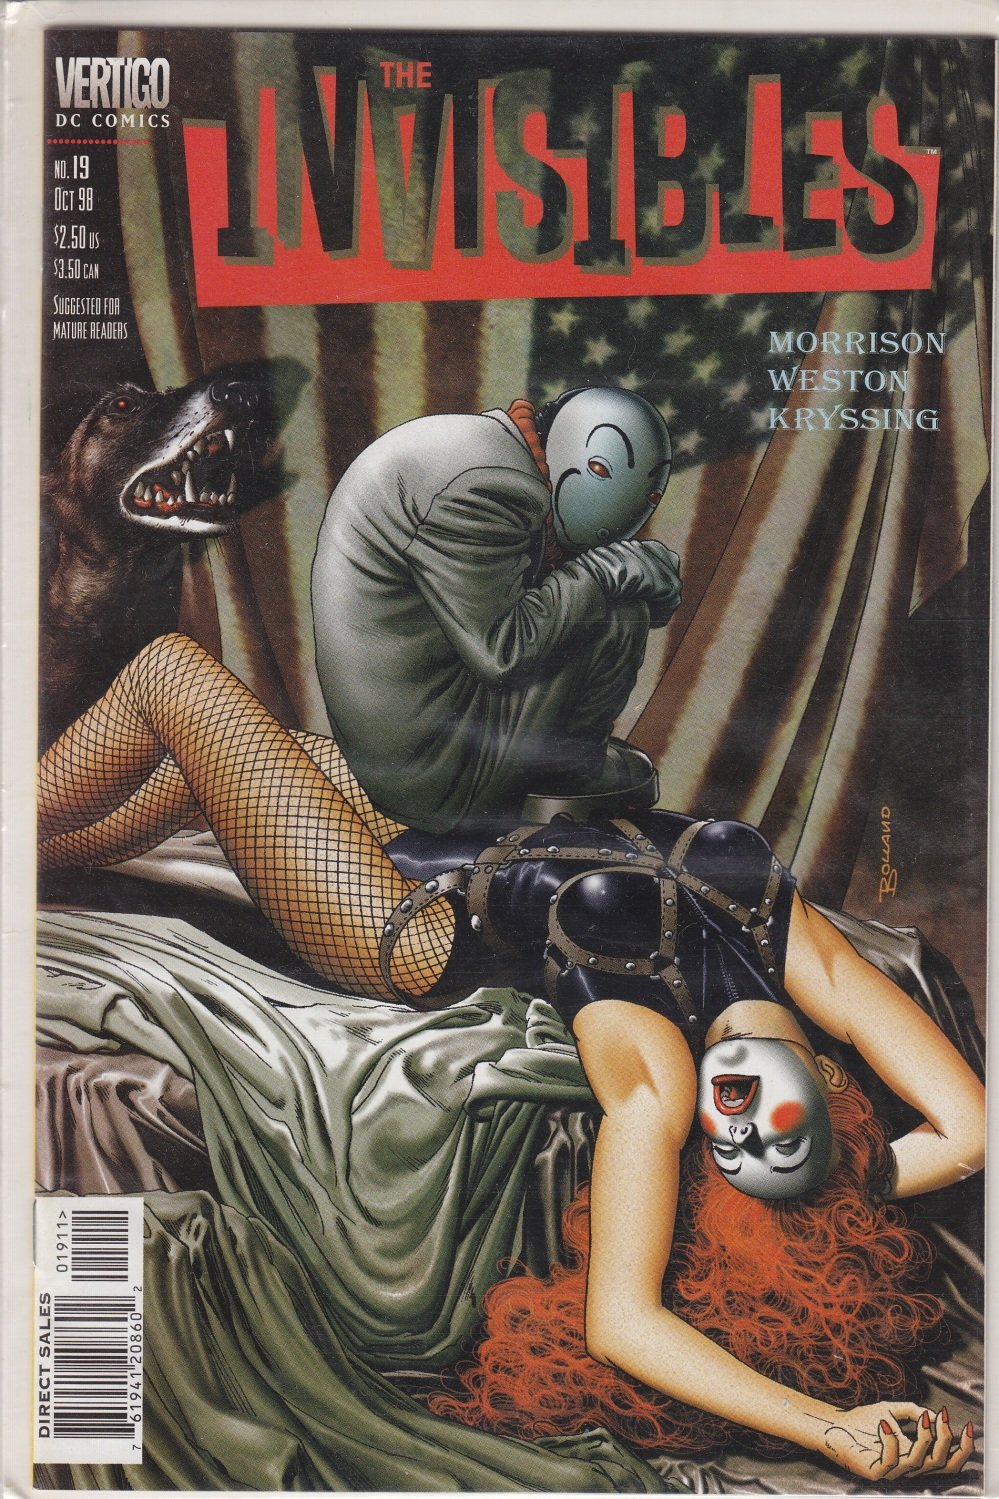 Vertigo The Invisibles No 19 DC Comics Morrison Weston Kryssing